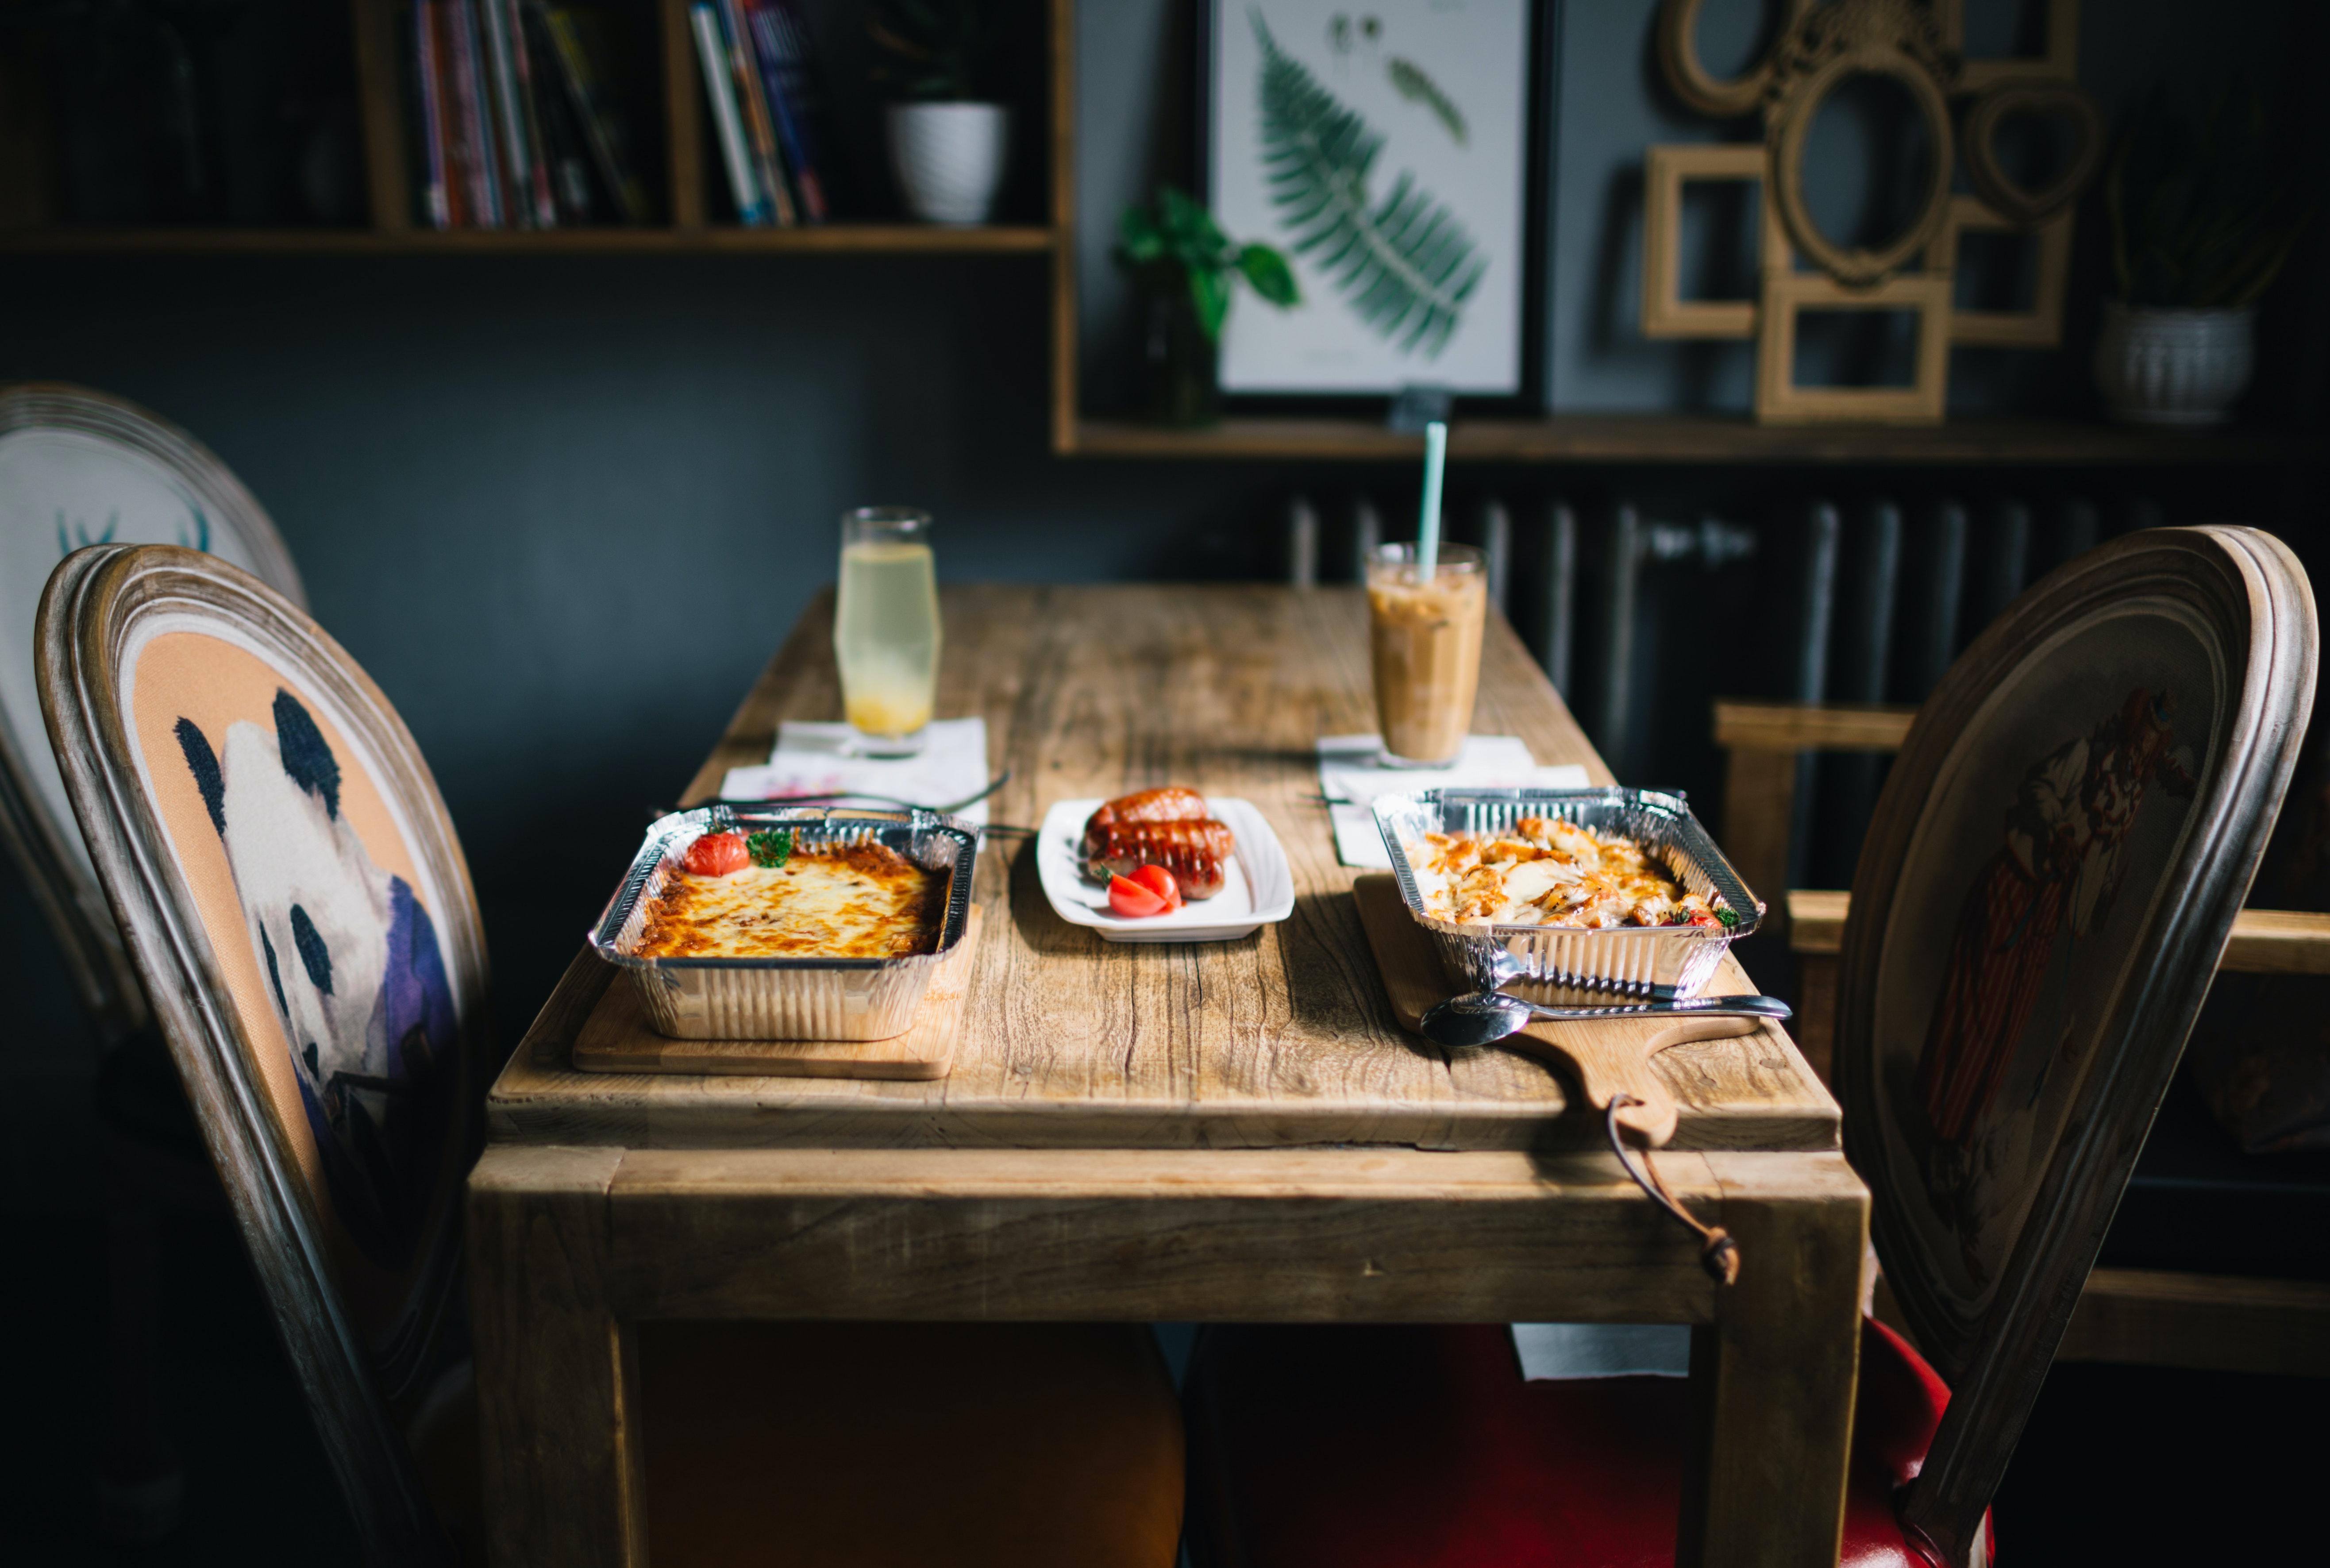 I consigli per decorare una sala da pranzo rustica